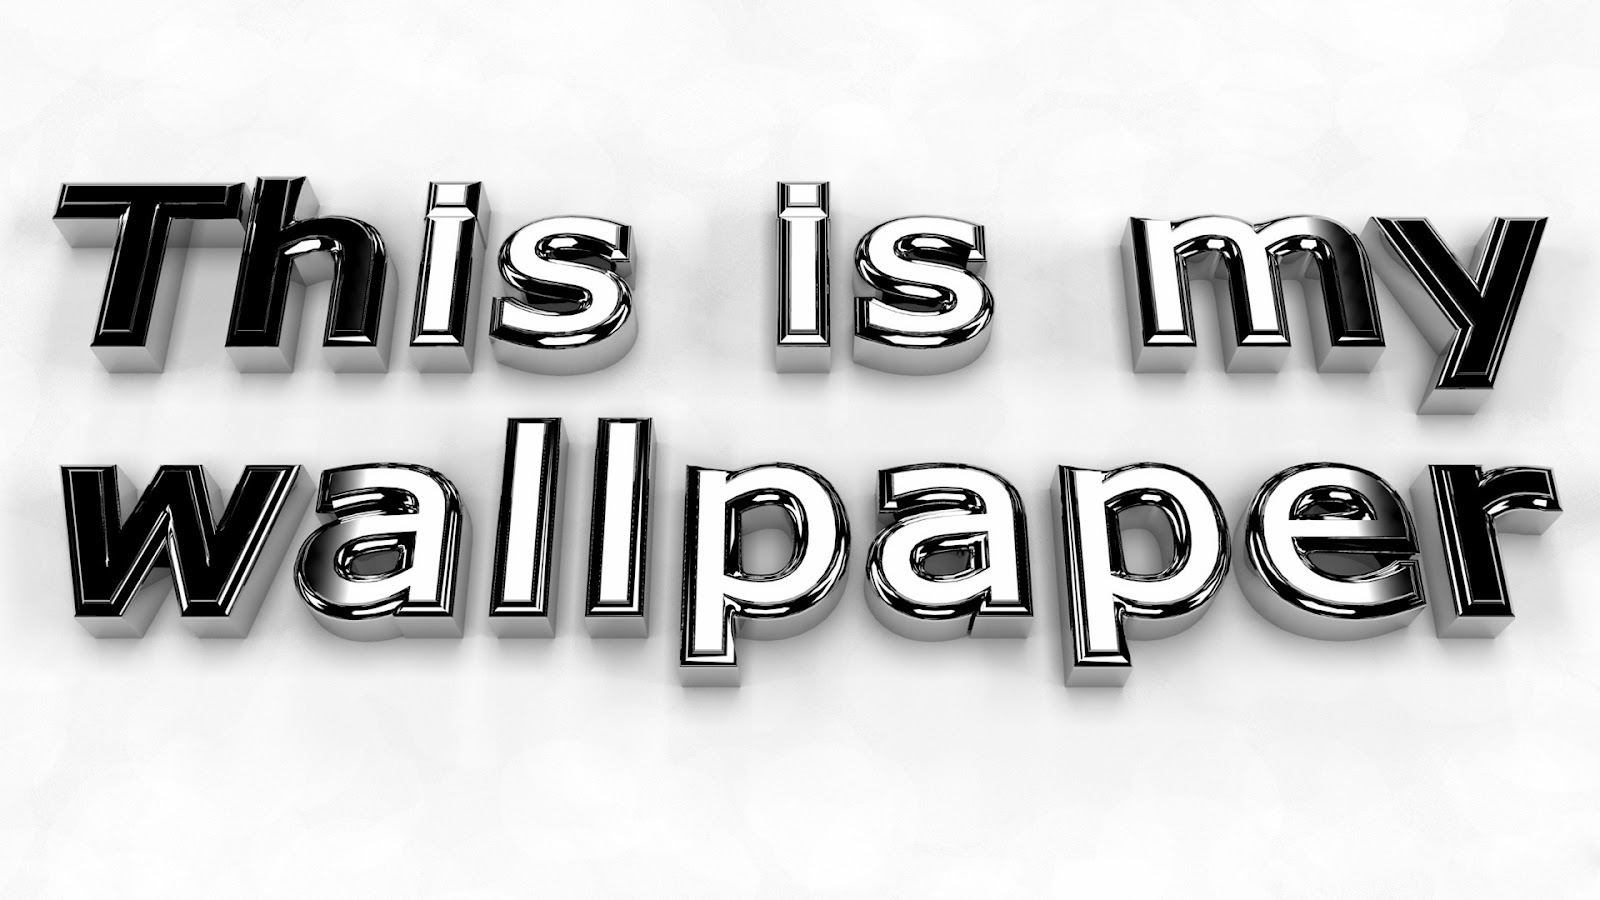 http://3.bp.blogspot.com/-WDWeMyjTRqY/T8aL_CdETUI/AAAAAAAAB2E/Ui0nTnQprxw/s1600/This_is_my_Wallpaper_3D_Metalic_Text_HD_Desktop_Wallpaper.jpg